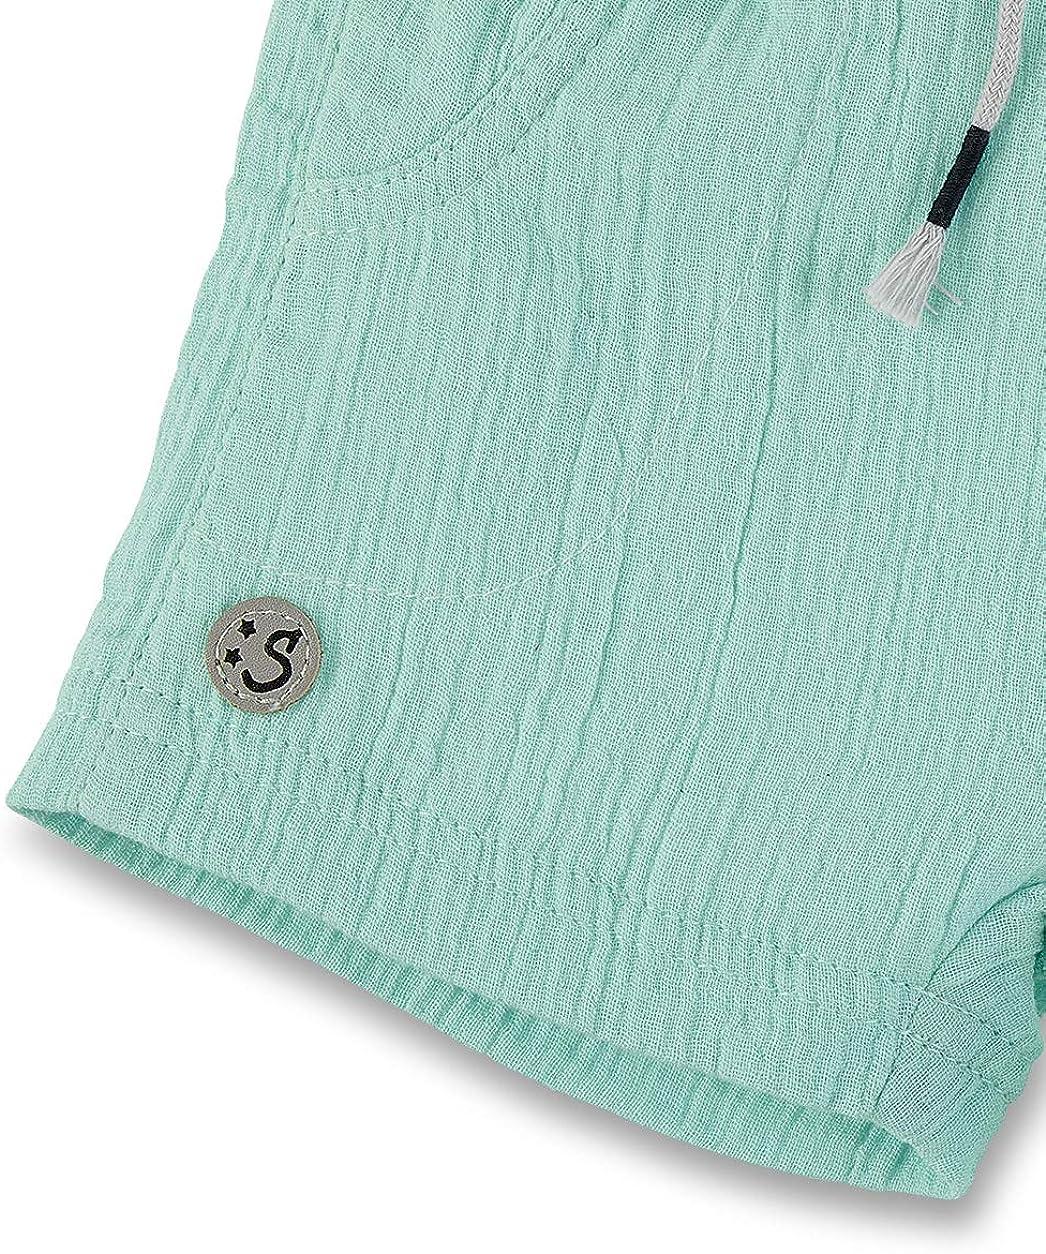 Sterntaler Court Pantalones Cortos para Beb/és